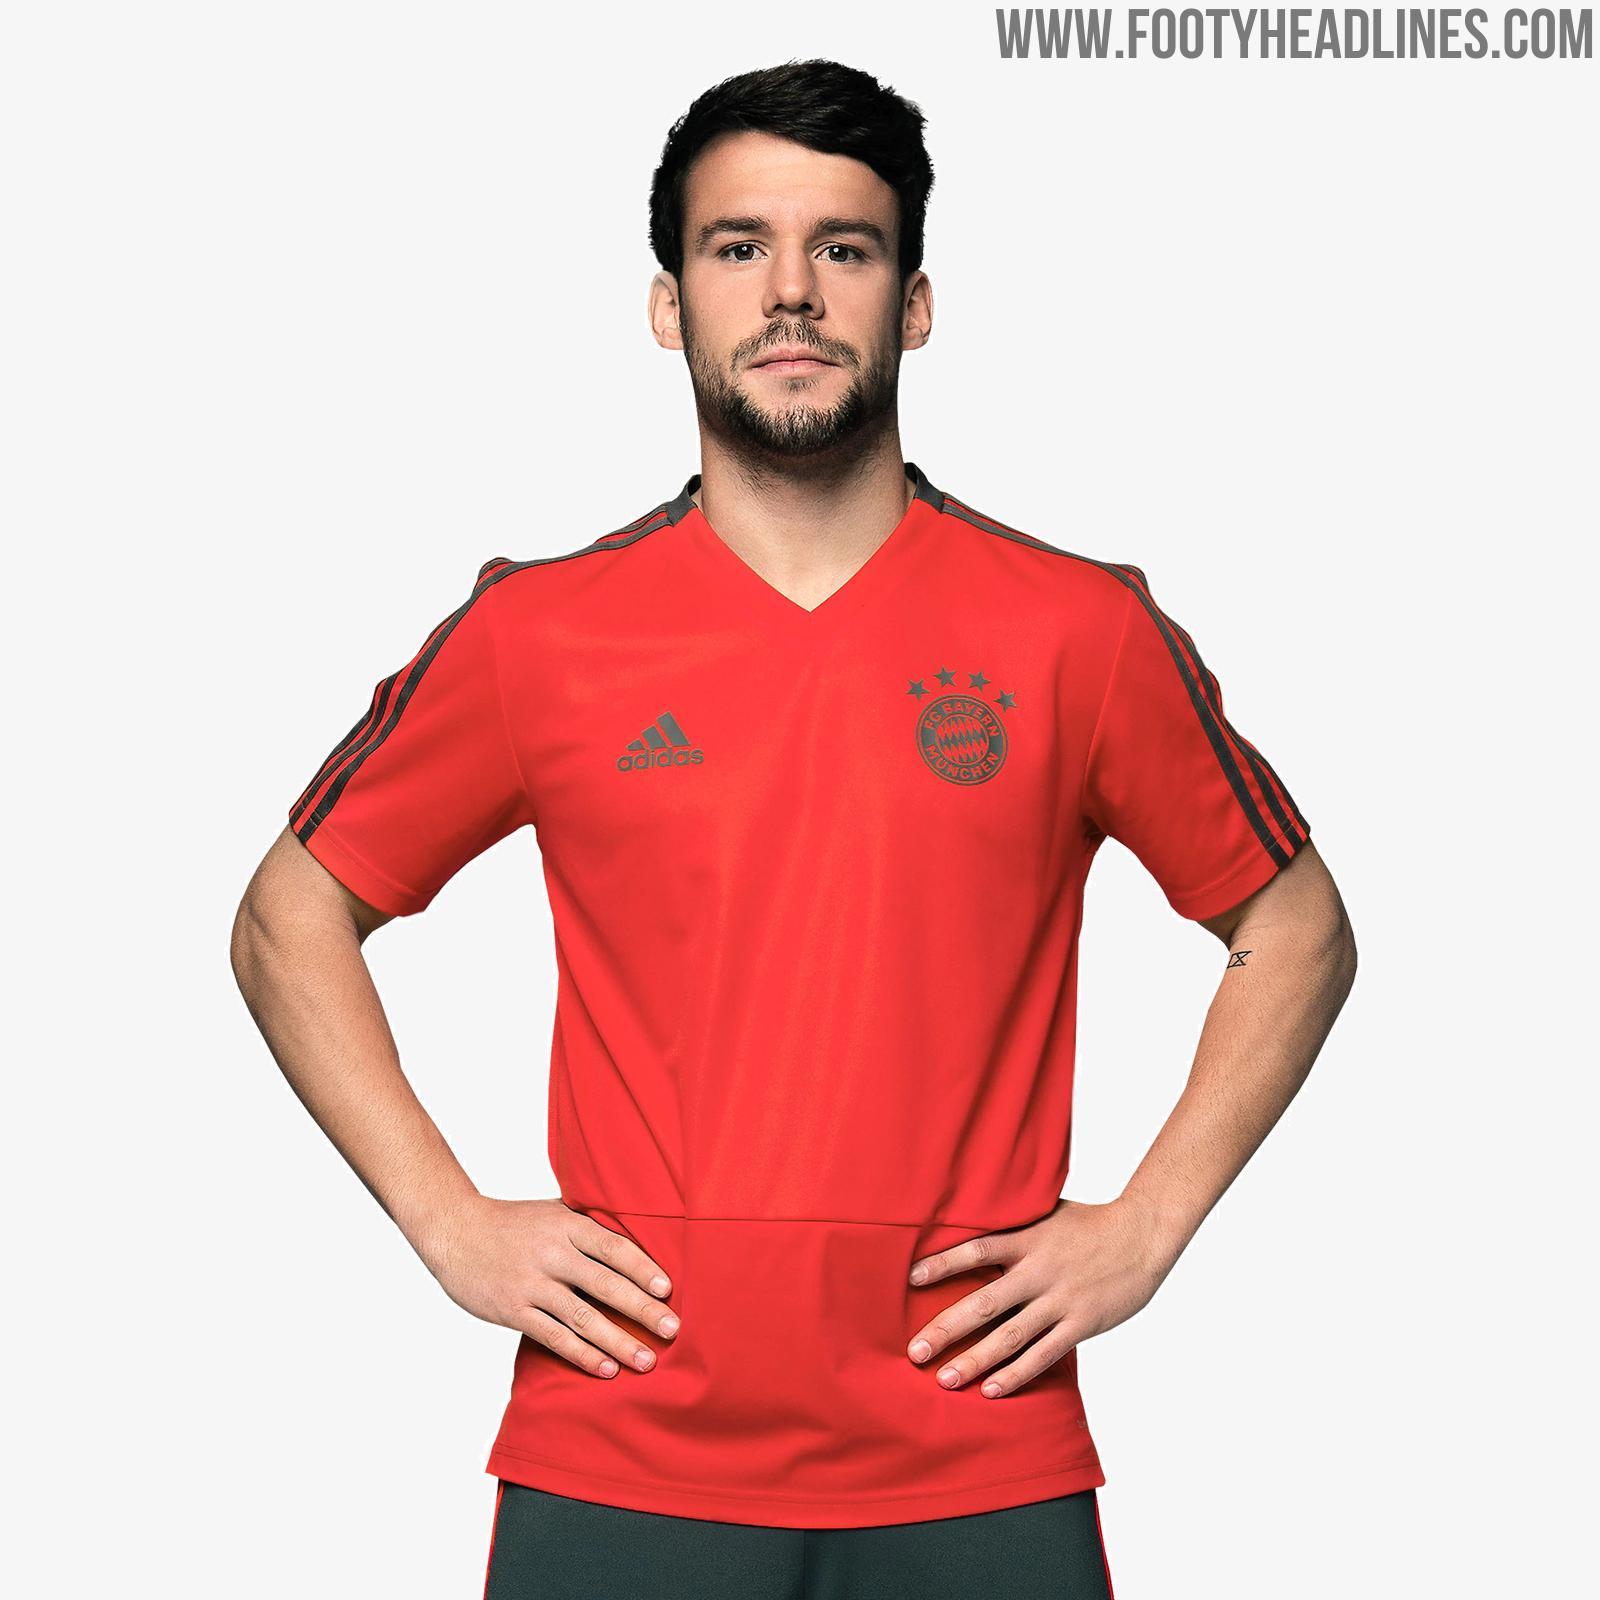 Bayern Munich 18-19 Training Kit Released